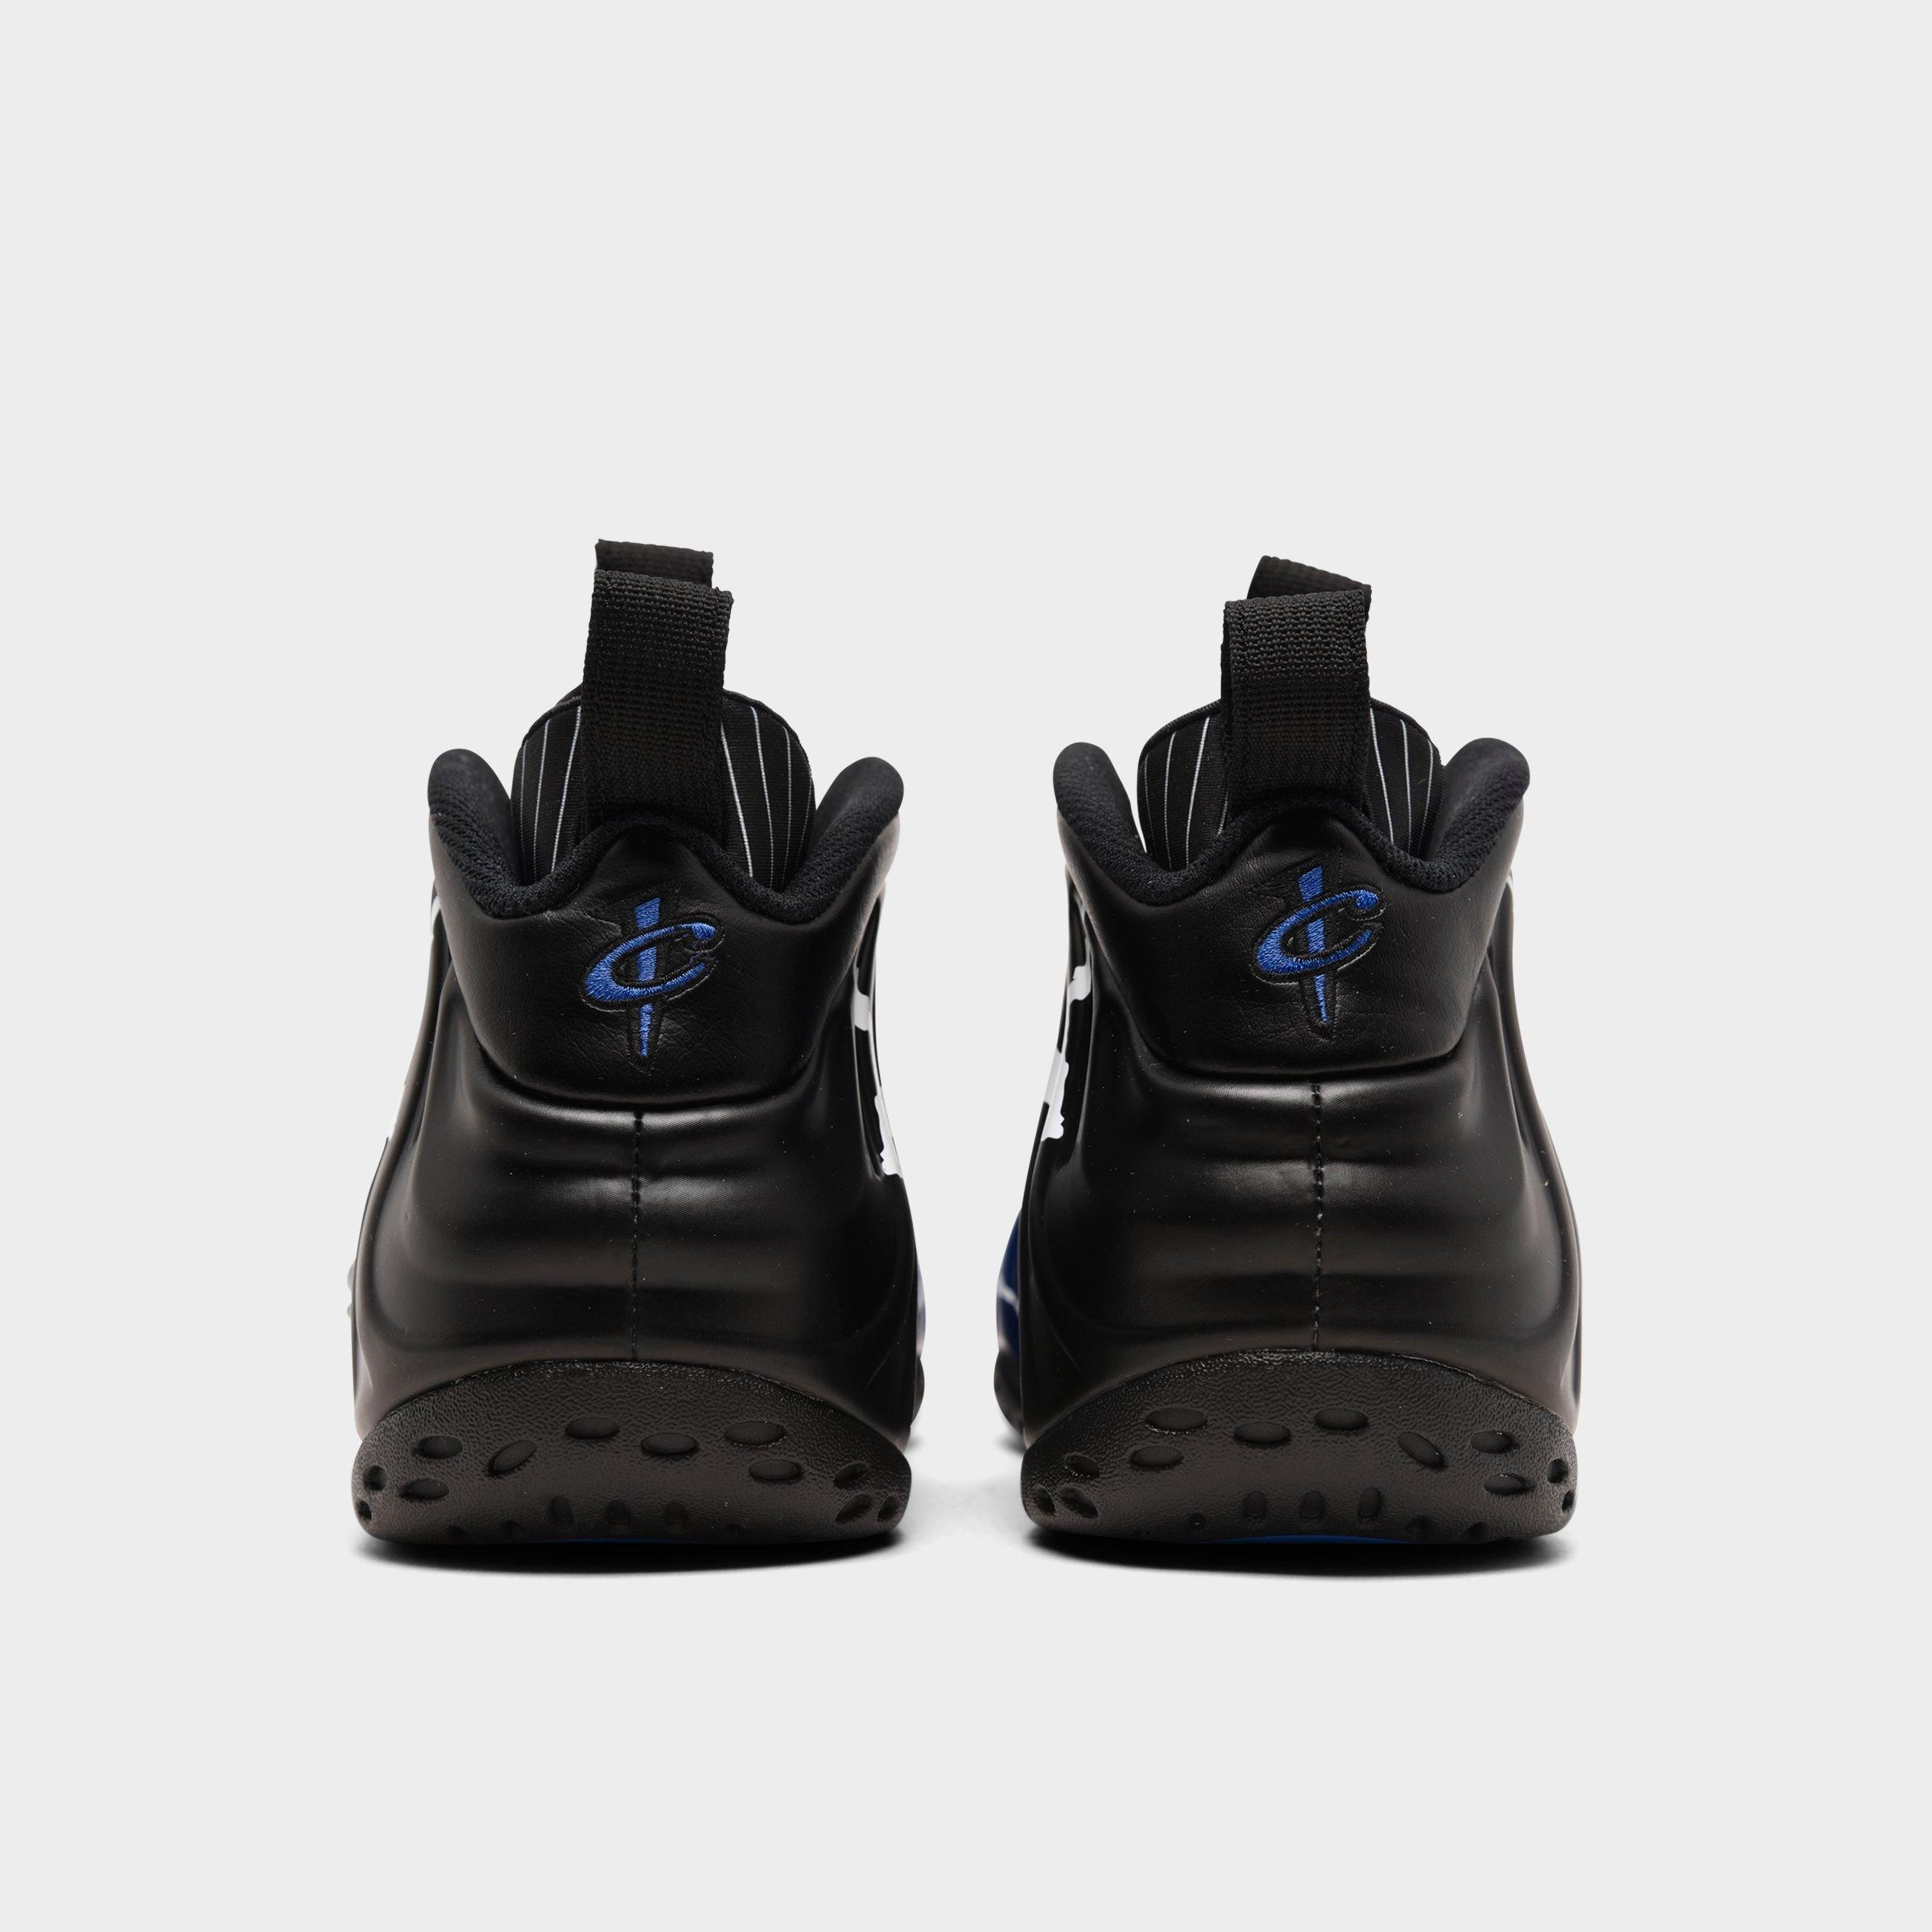 314996 081 Nike Air Foamposite One Dirty Copper Black ...